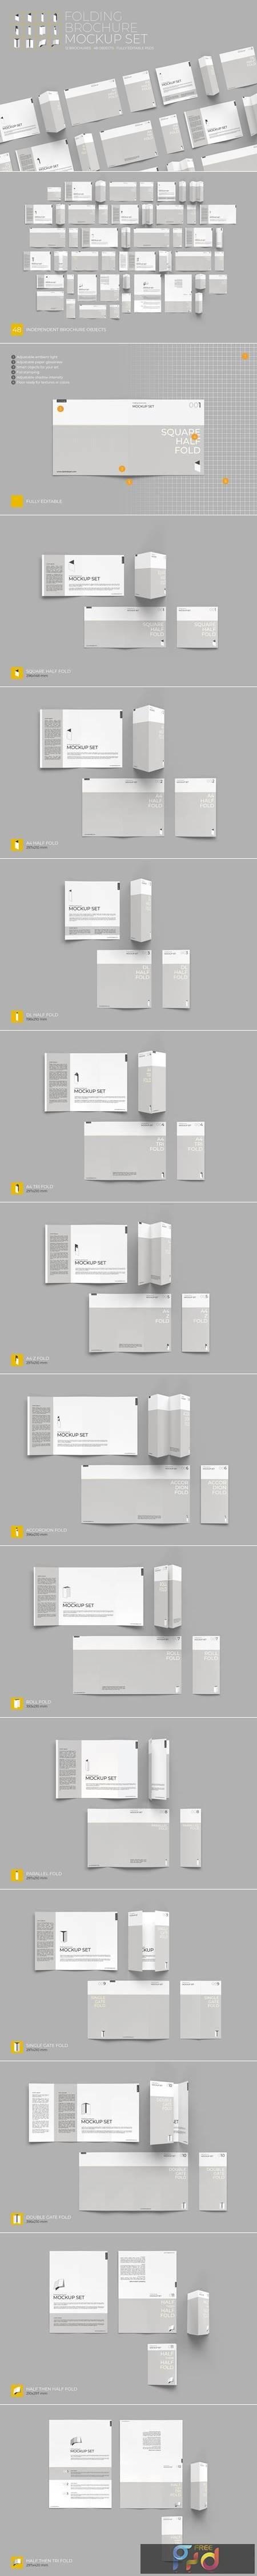 Folding Brochure Mockup Set 4409695 1